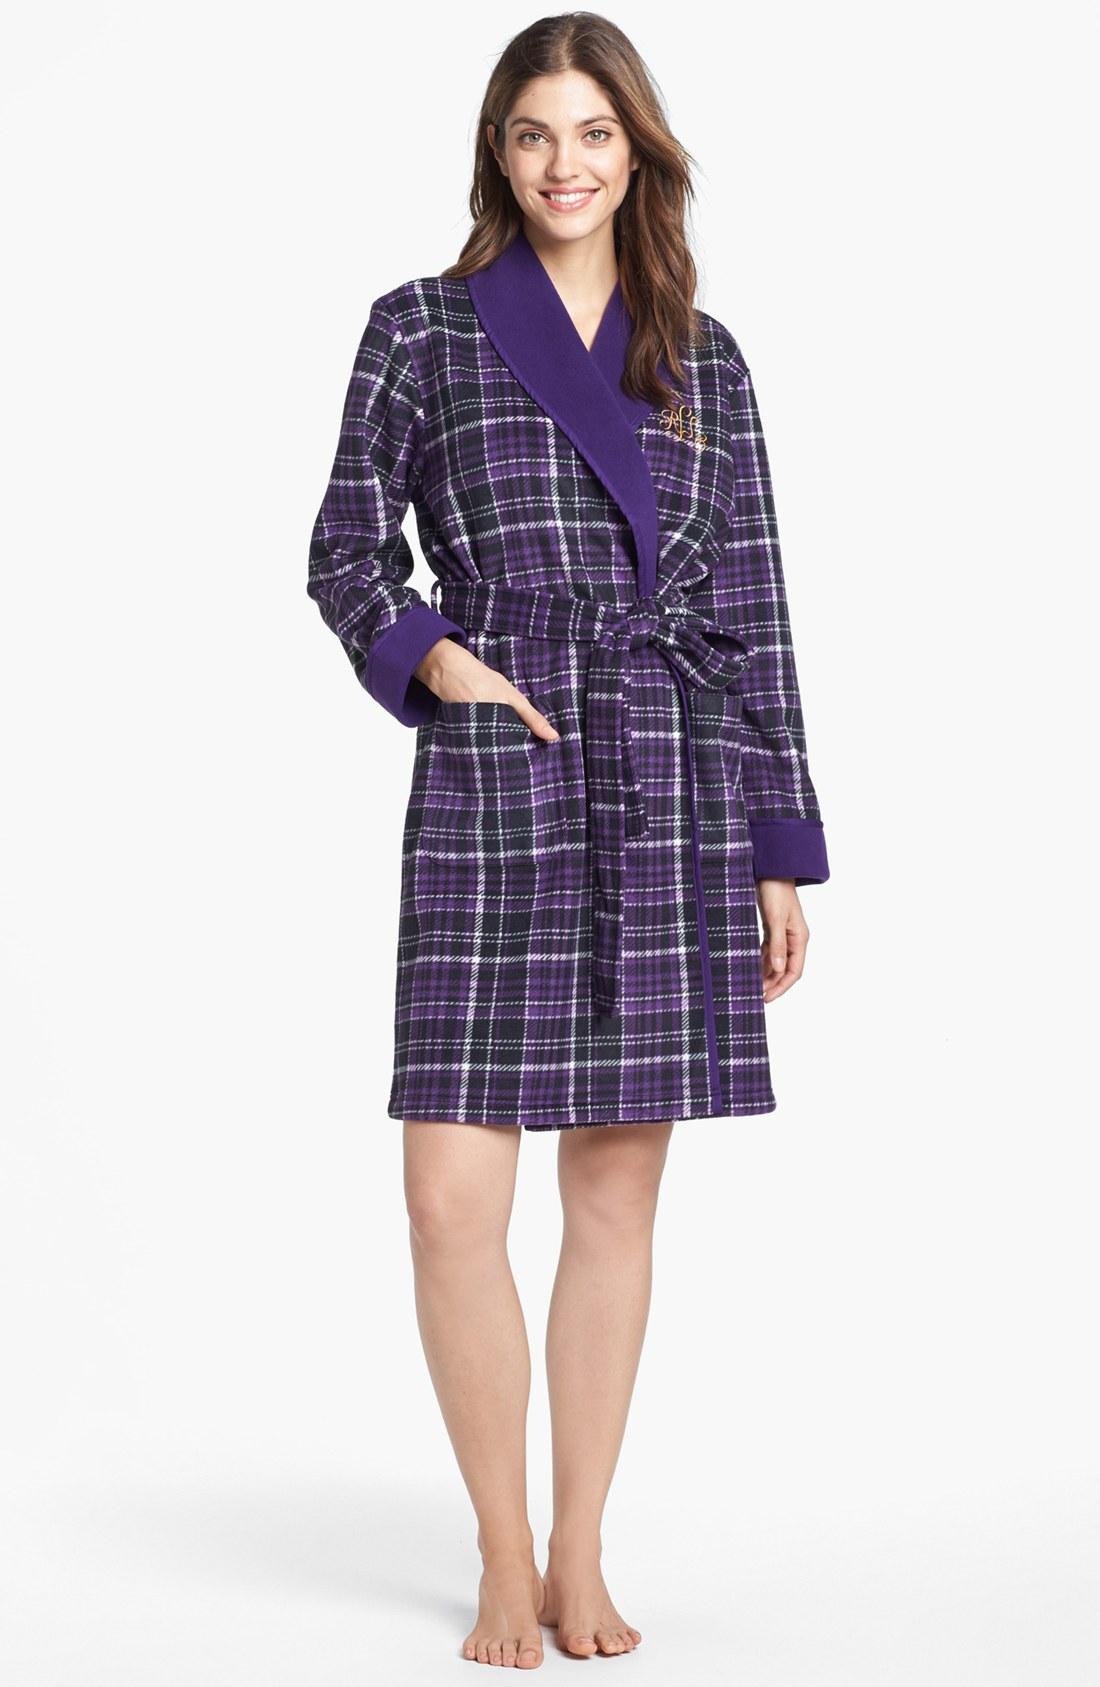 lauren by ralph lauren shawl collar robe in purple emerson tartan purple plaid lyst. Black Bedroom Furniture Sets. Home Design Ideas